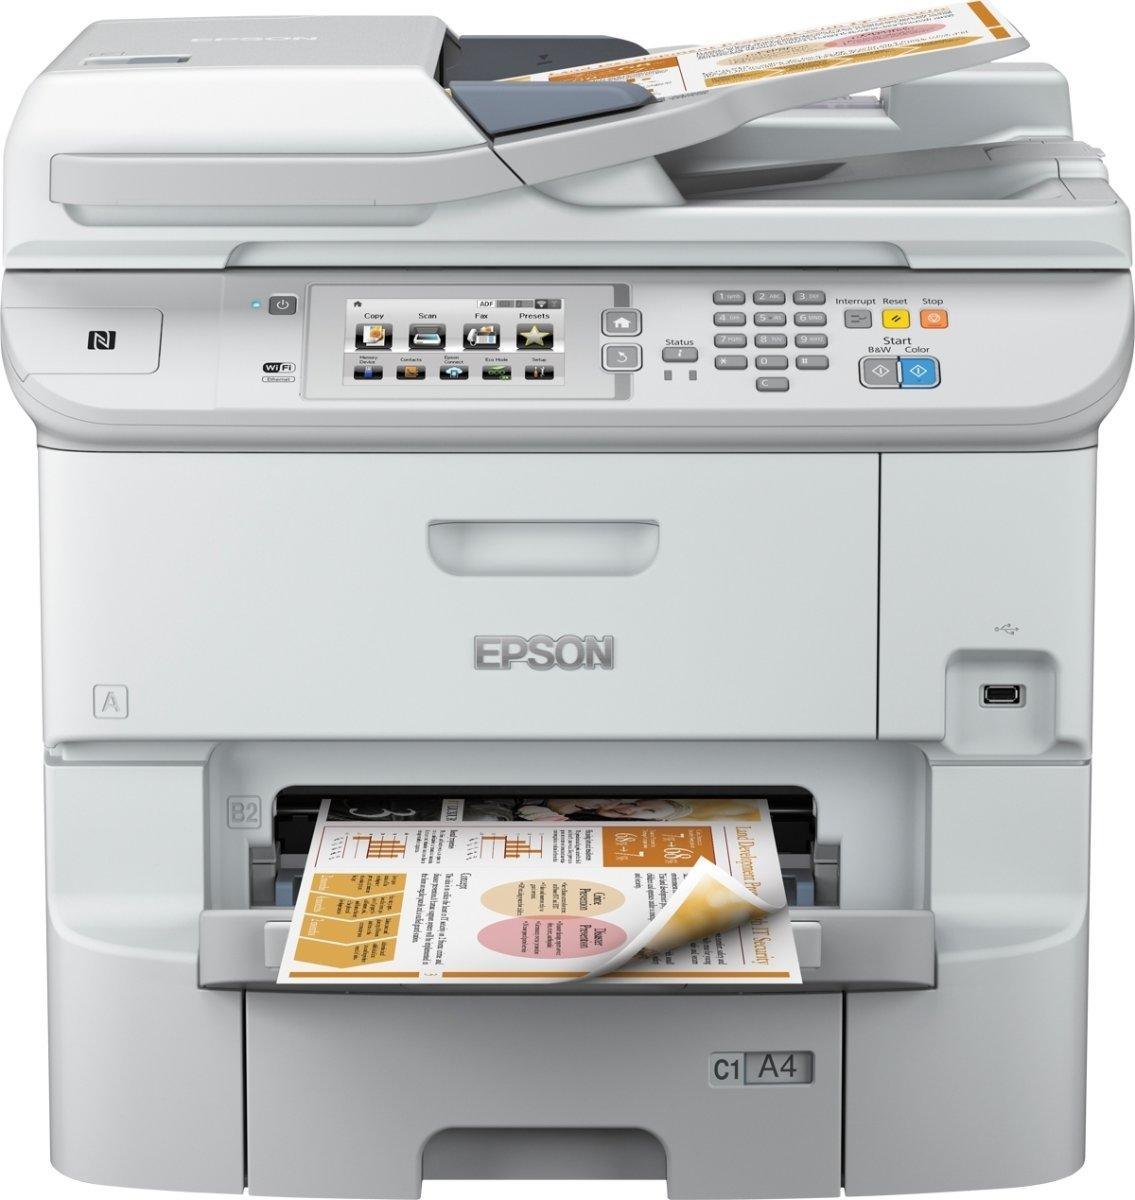 EPSON WorkForce Pro WF-6590DWF MFP farveprinter